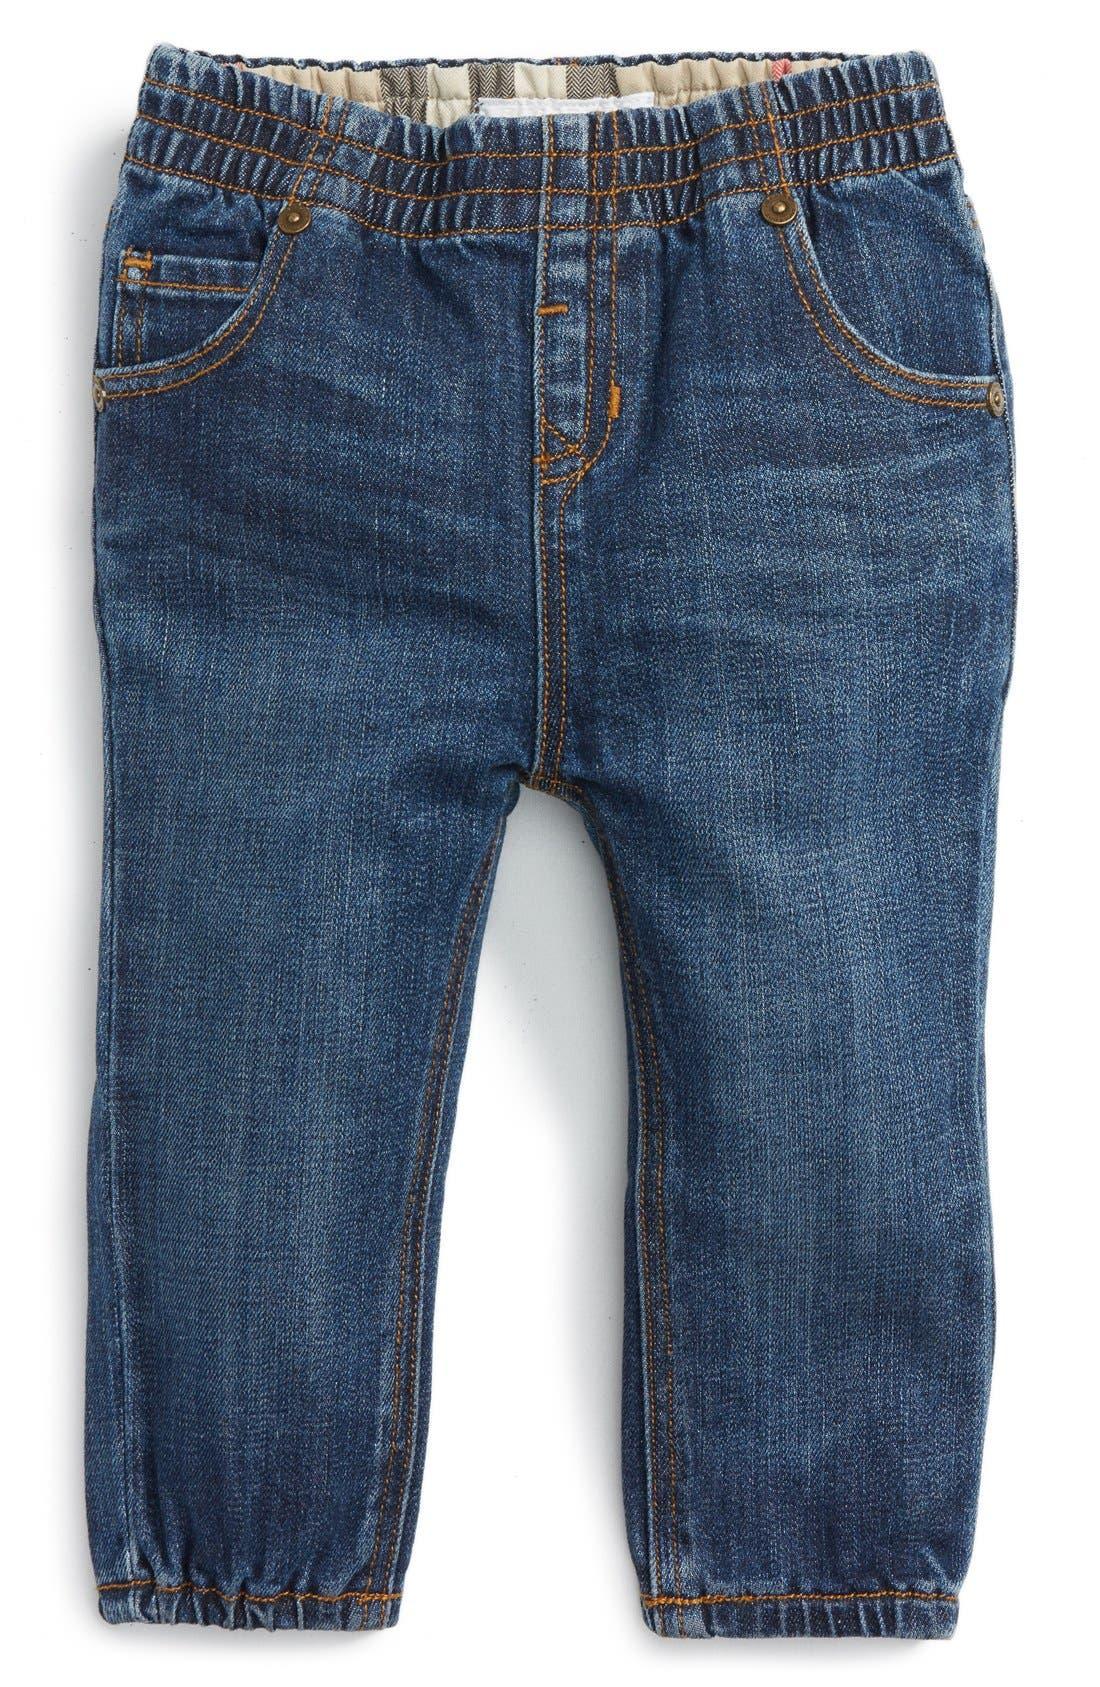 Eloise Denim Jogger Pants,                         Main,                         color, Indigo